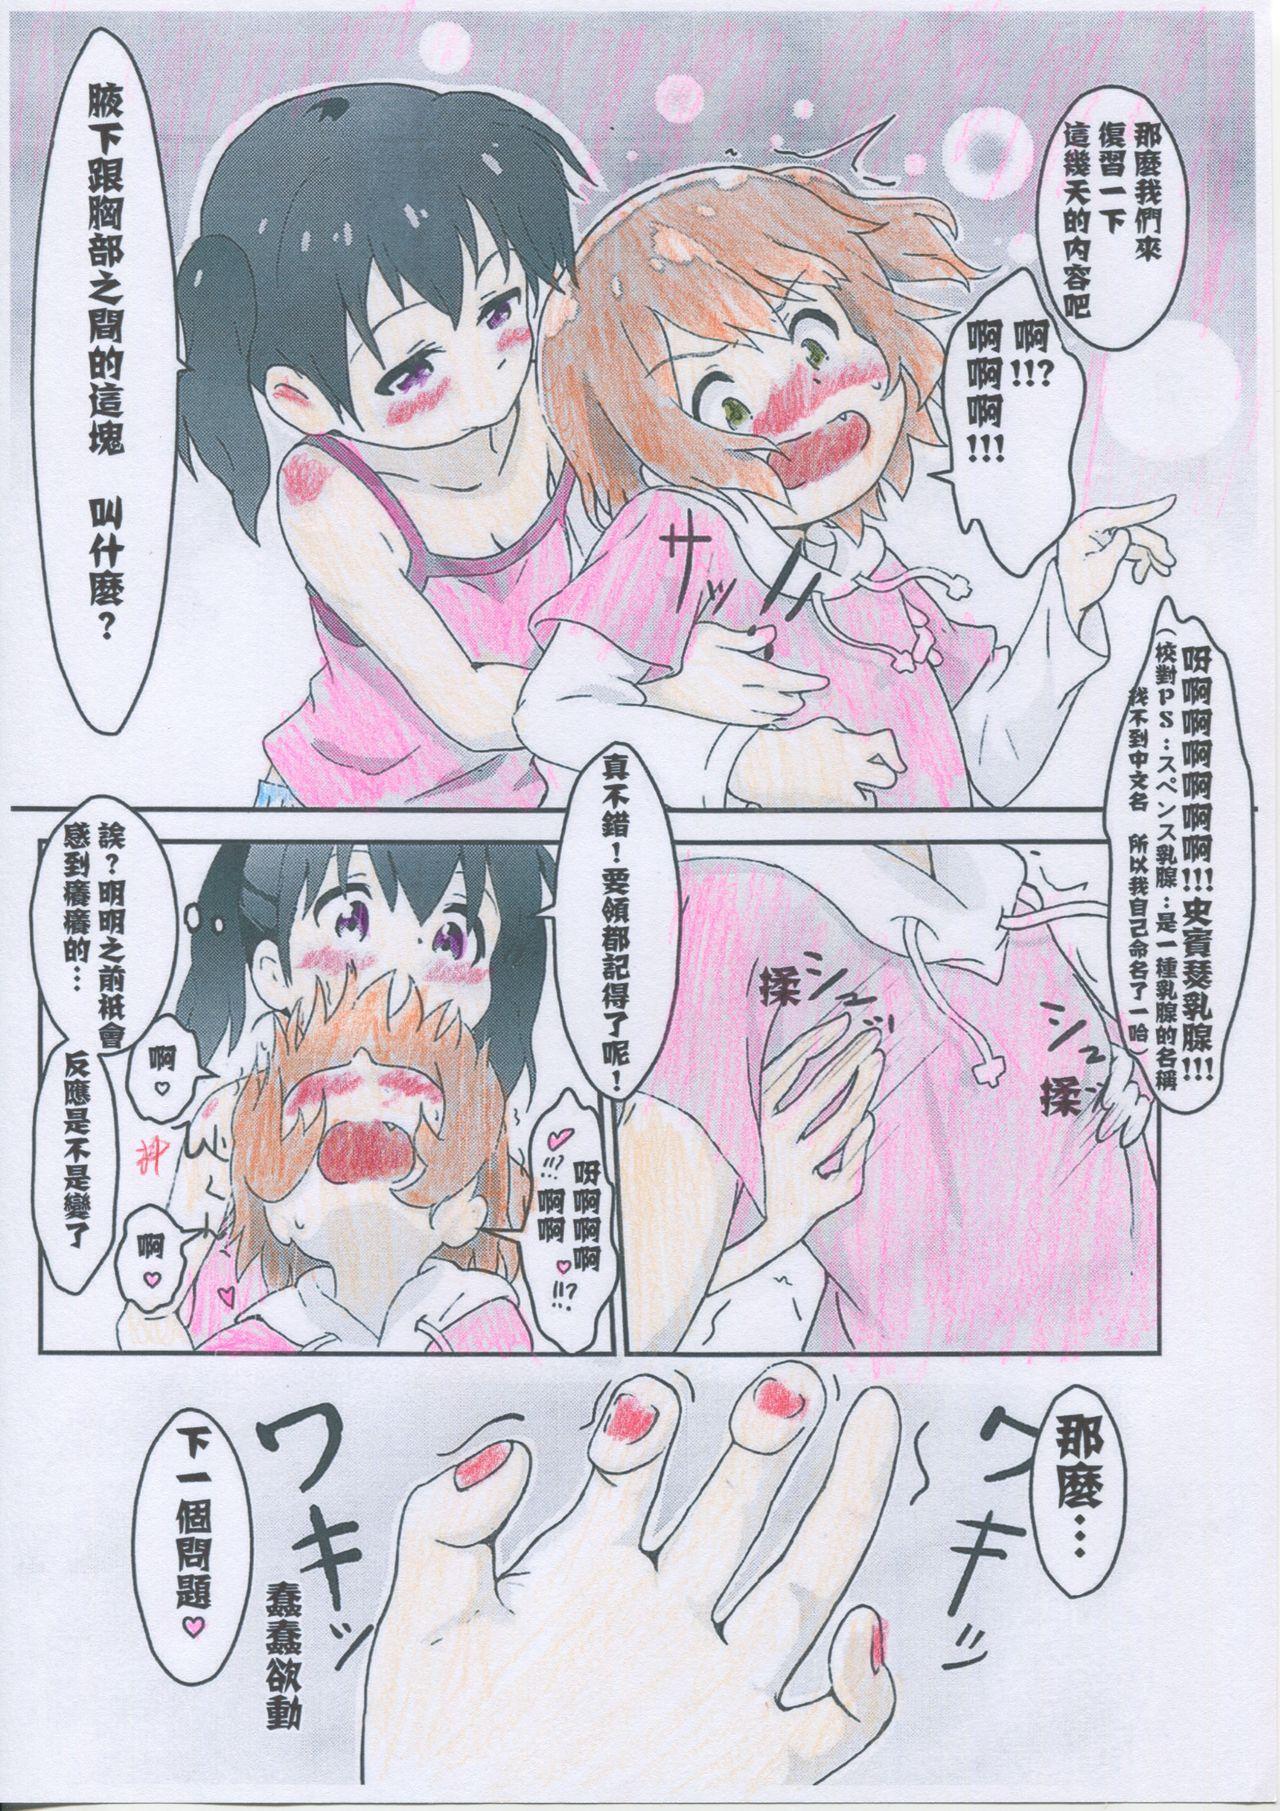 Hinata no Katei Kyoushi wa Hinata 5